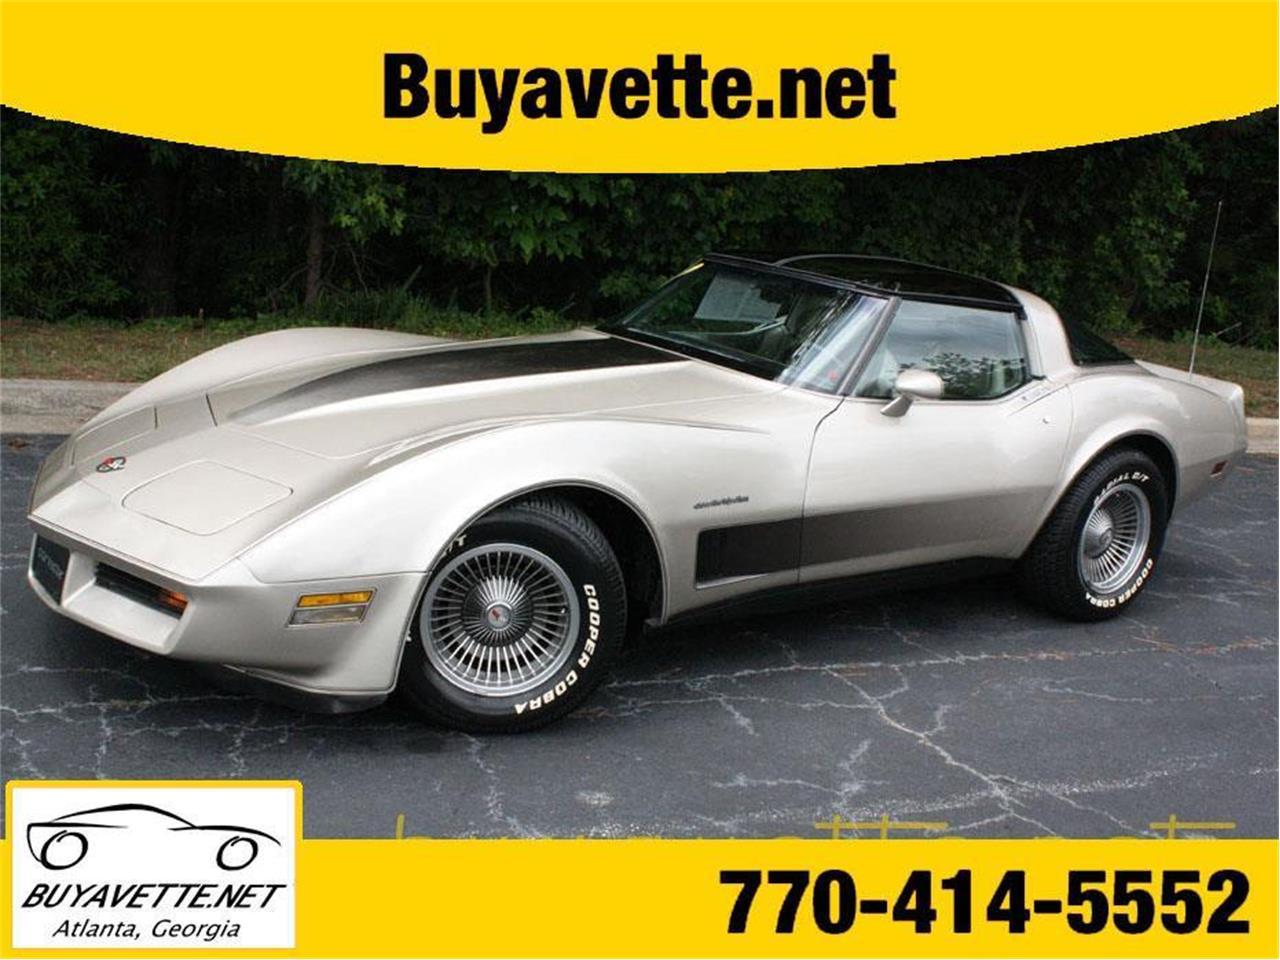 1982 Corvette For Sale >> For Sale 1982 Chevrolet Corvette In Atlanta Georgia